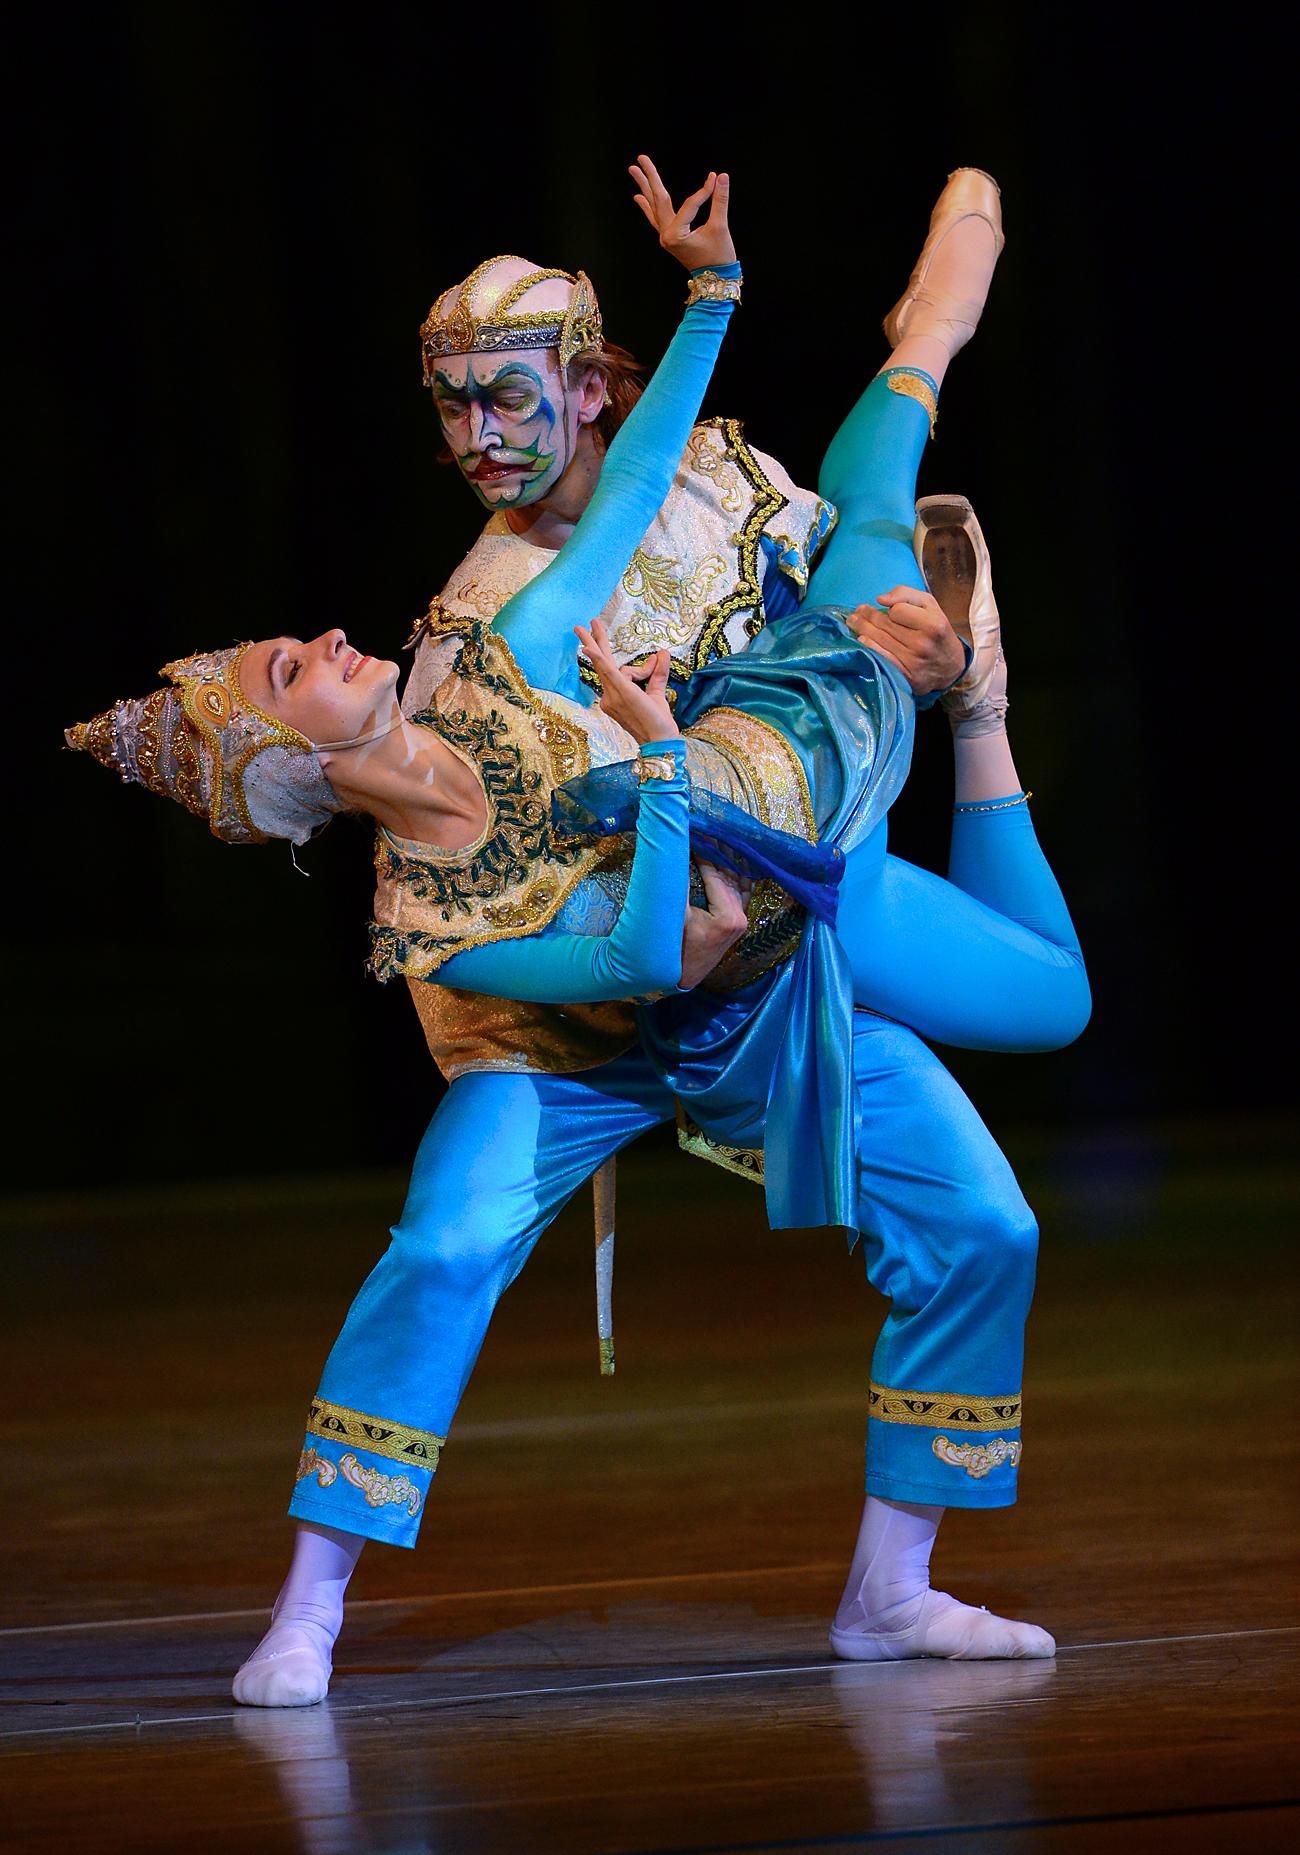 "Penari balet Kirill Yermolenko dan Alisa Aslanova memetaskan tari balet ""Katya dan Pangeran Siam"" pada acara pembukaan Festival Balet Internasional IV di Kremlin. Sumber: Vladimir Vyatkin/RIA Novosti"